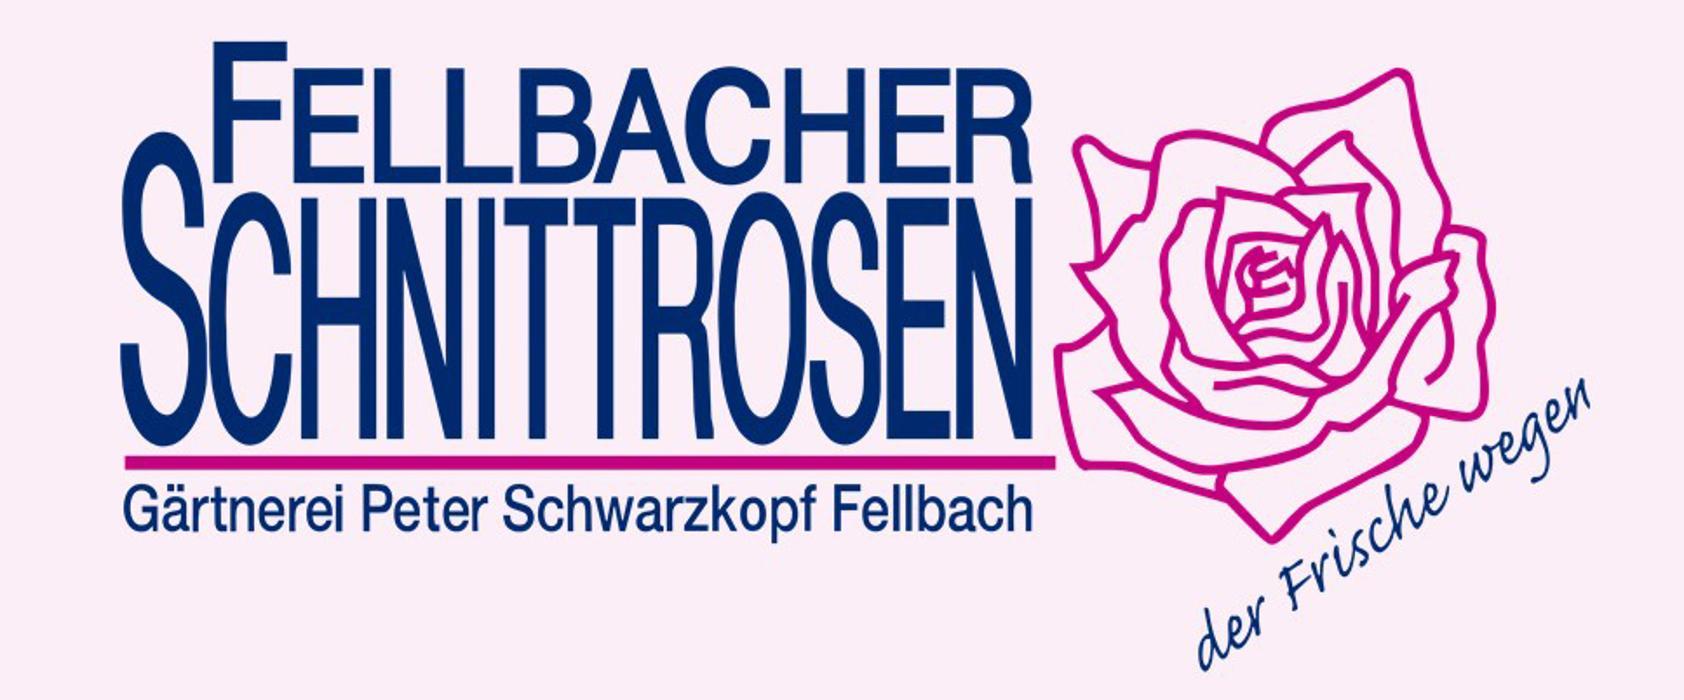 Fellbacher SchnittrosenGrtnerei Peter Schwarzkopf in